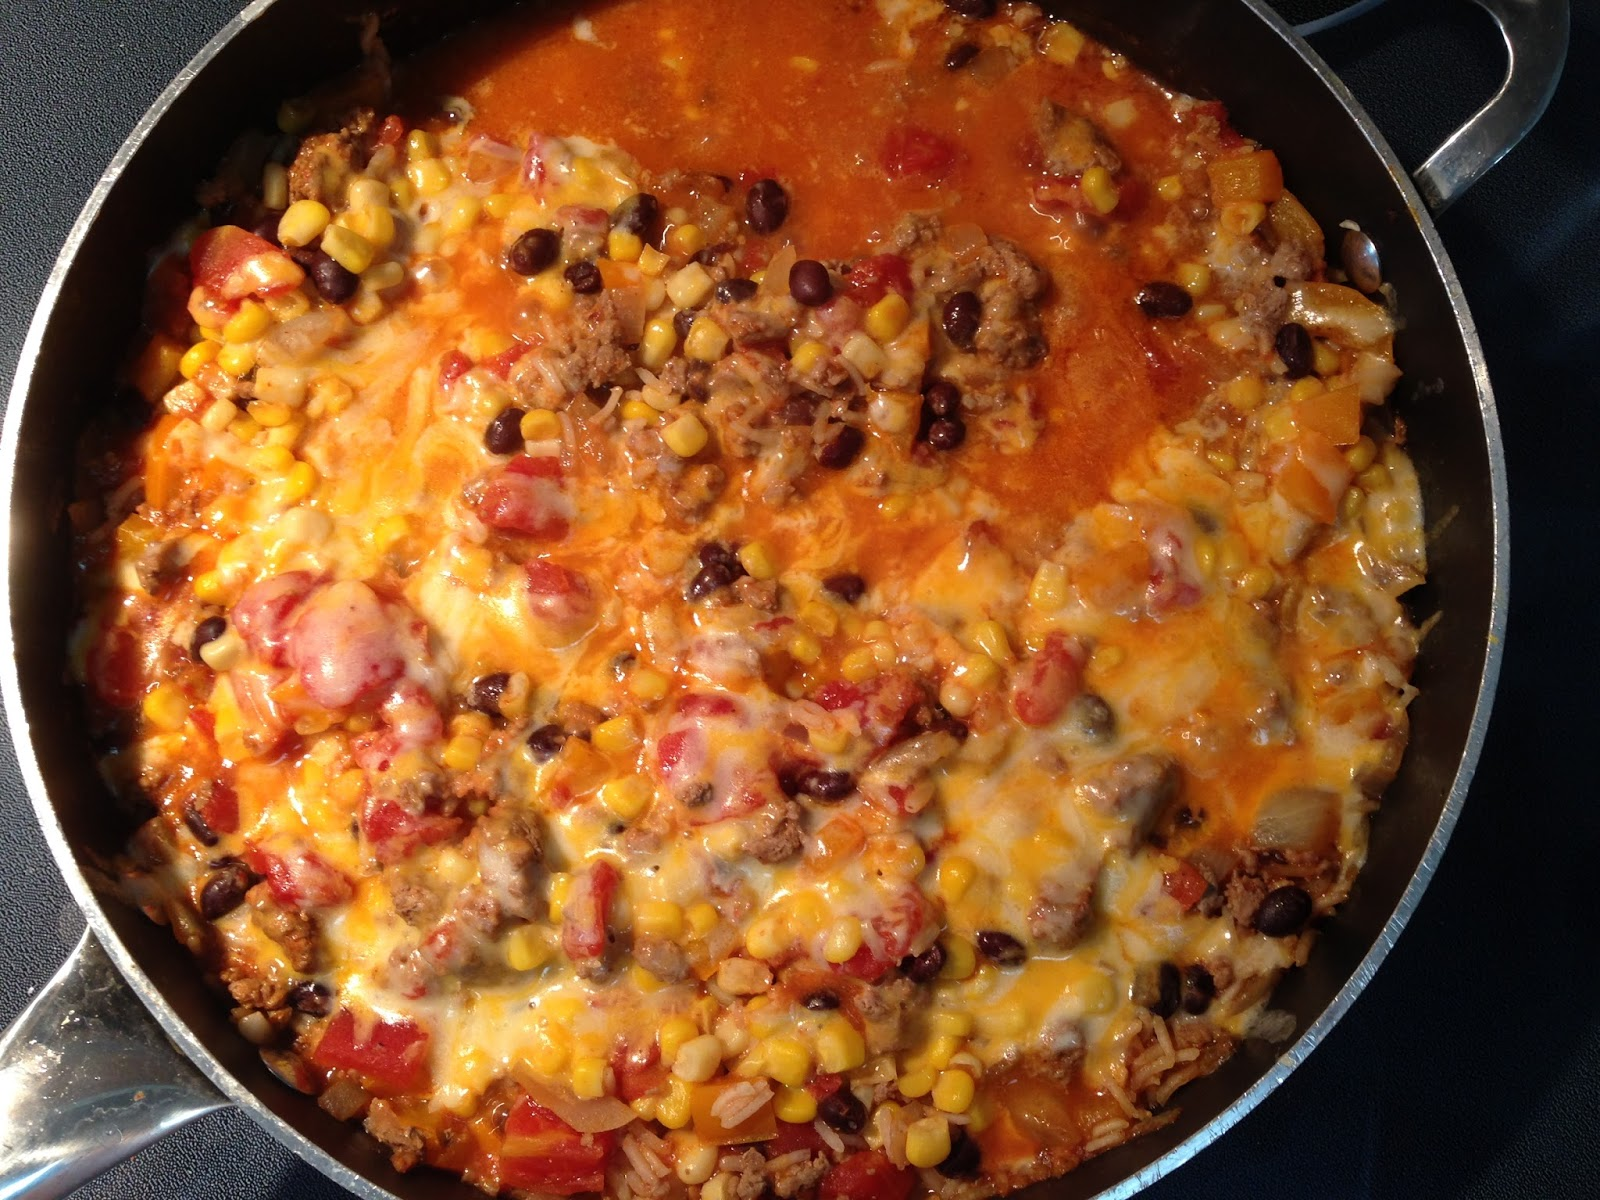 HoneyBears & SydneyBeans: Mother's Day and Texas Hash